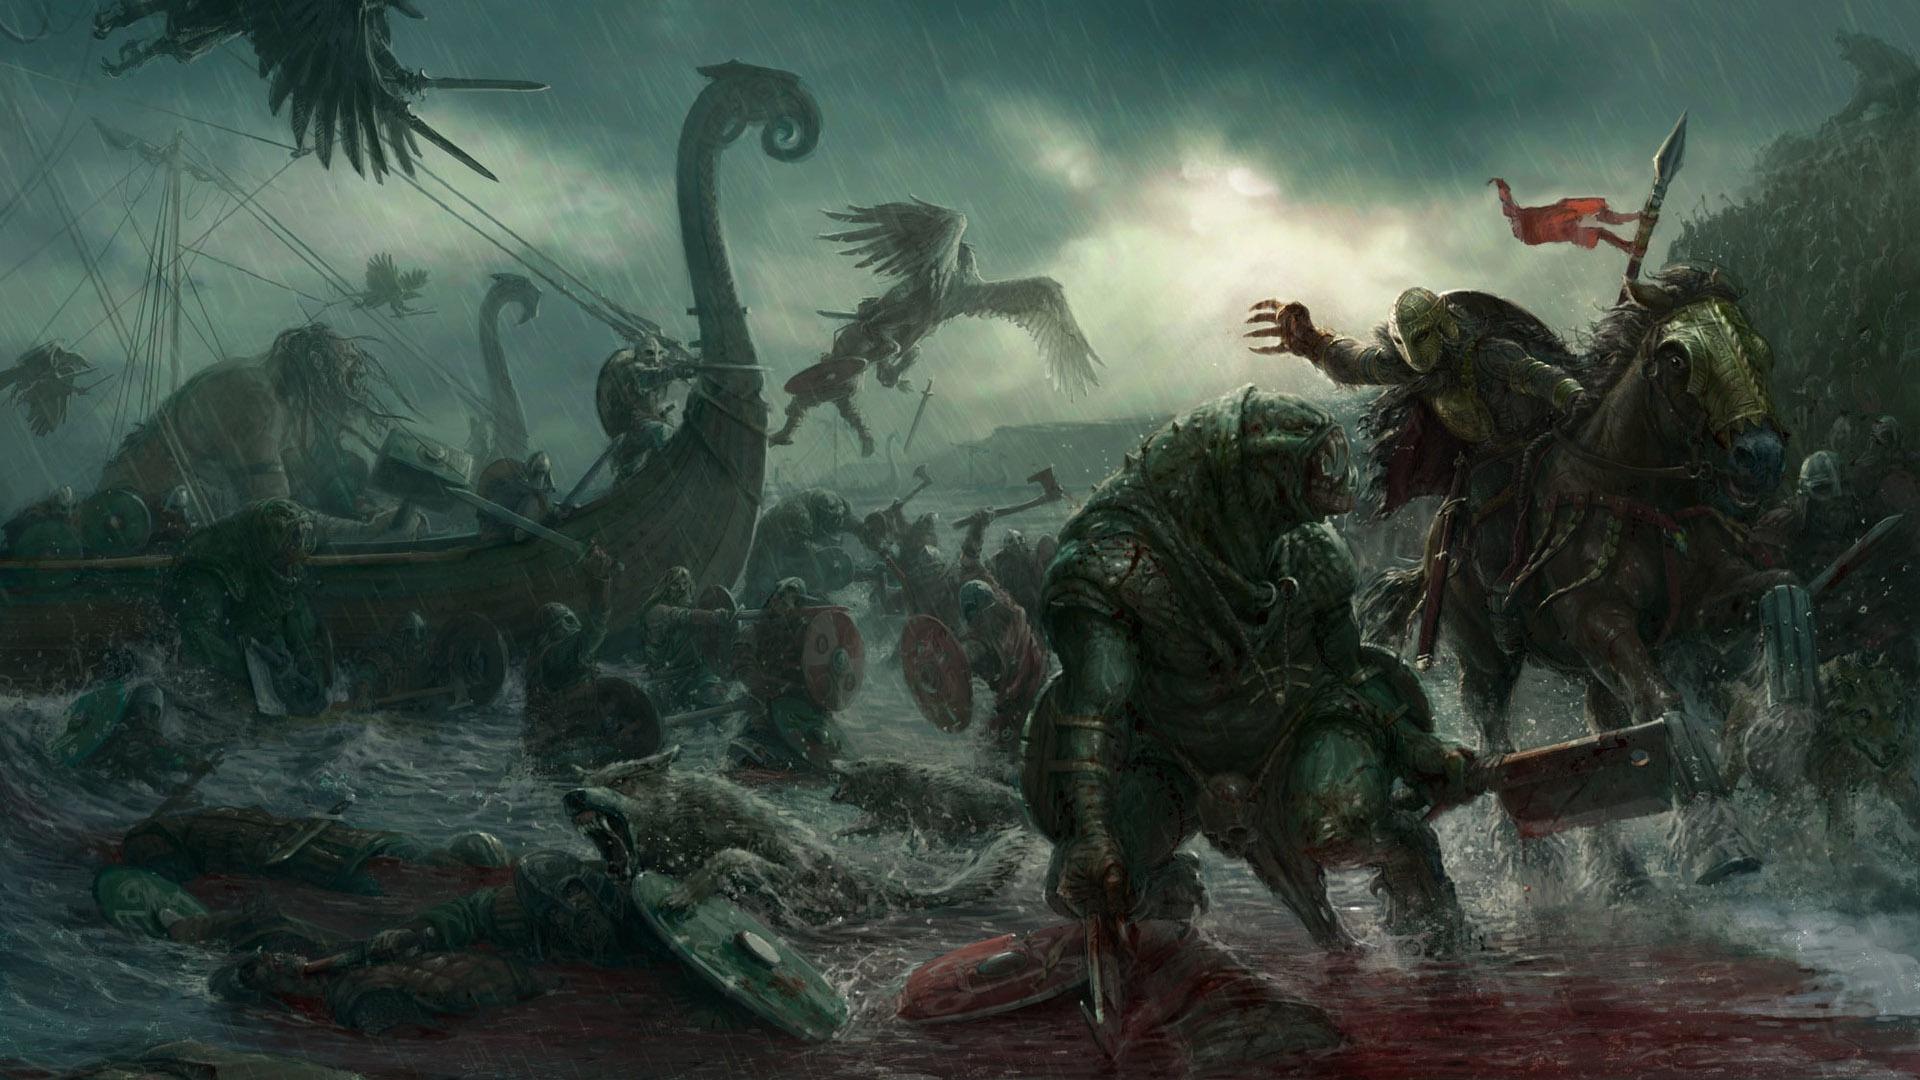 Wallpaper Dark Fantasy Battle Creature Artwork Fantasy Art